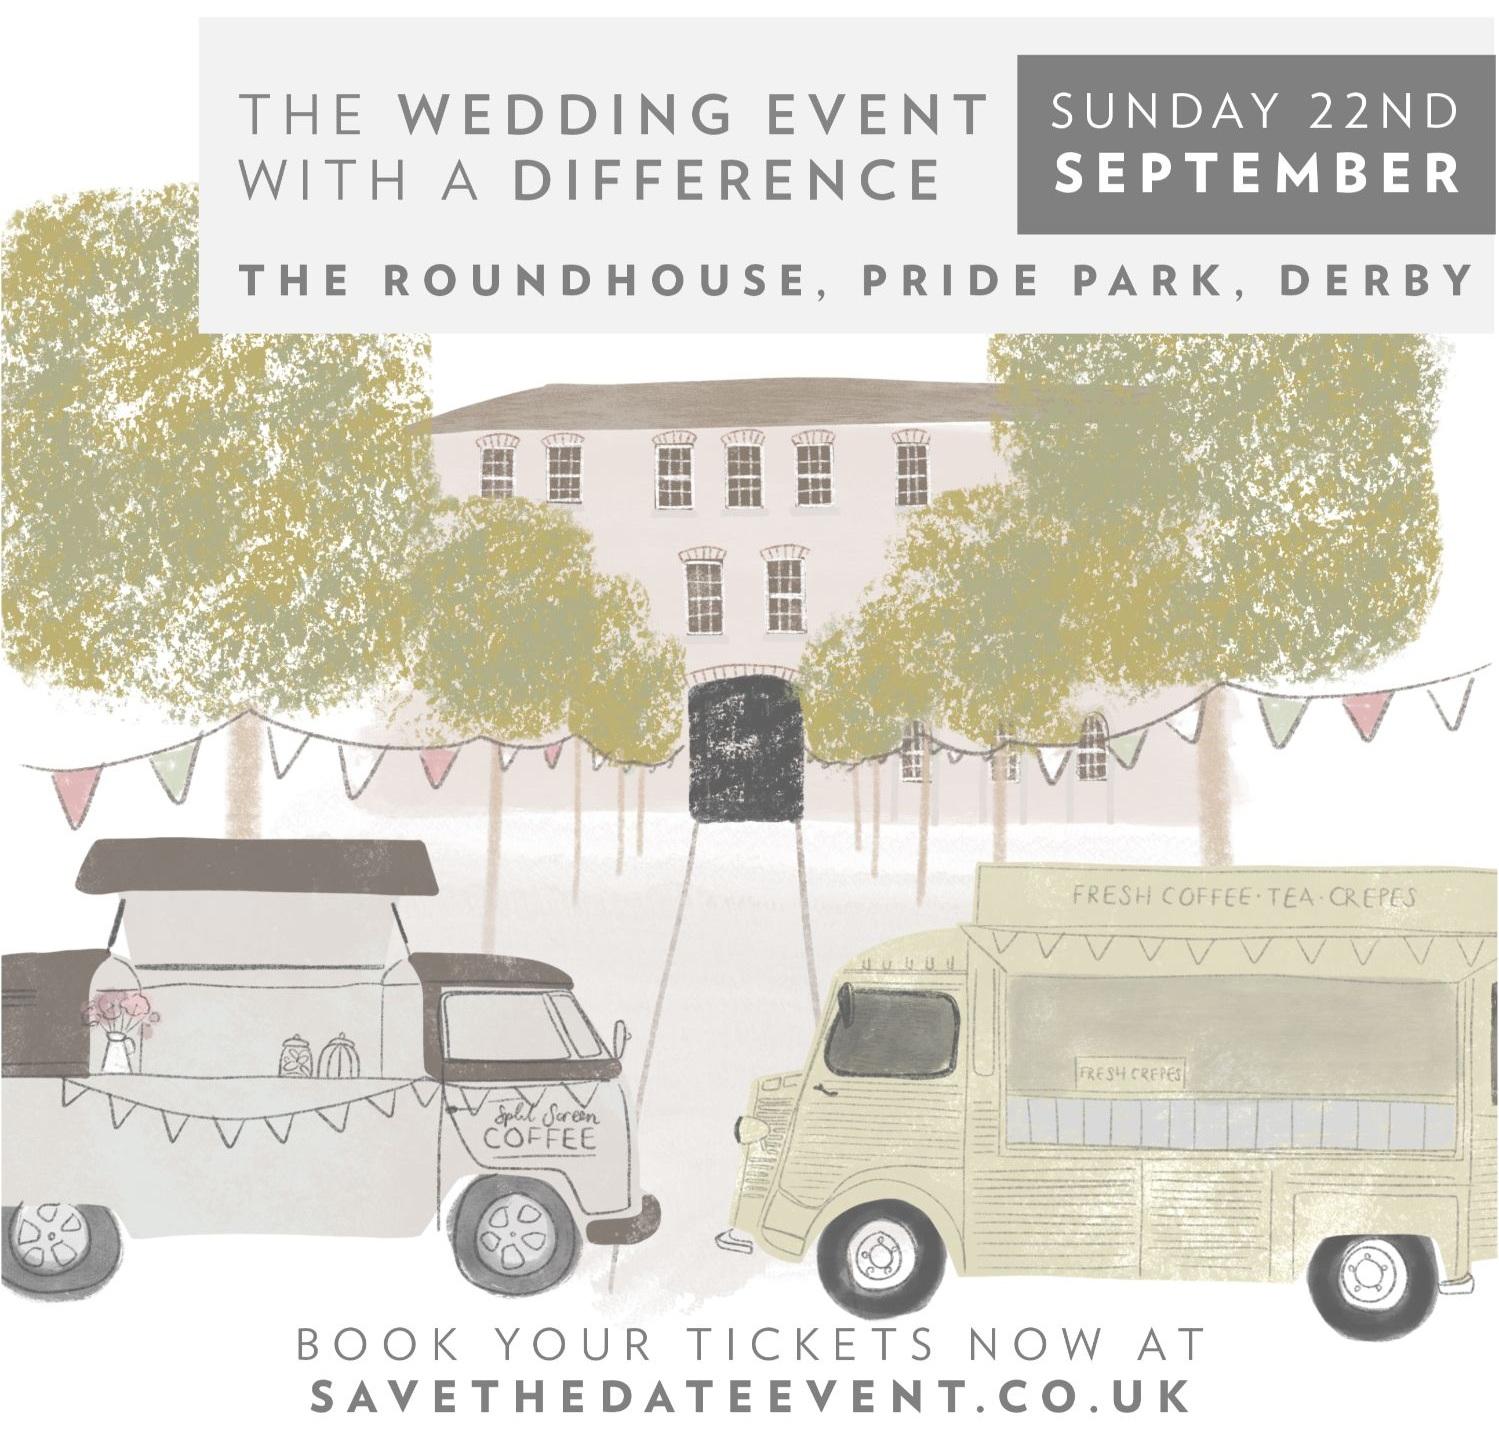 Wedding-Event-Derby-Roundhouse-1.jpg